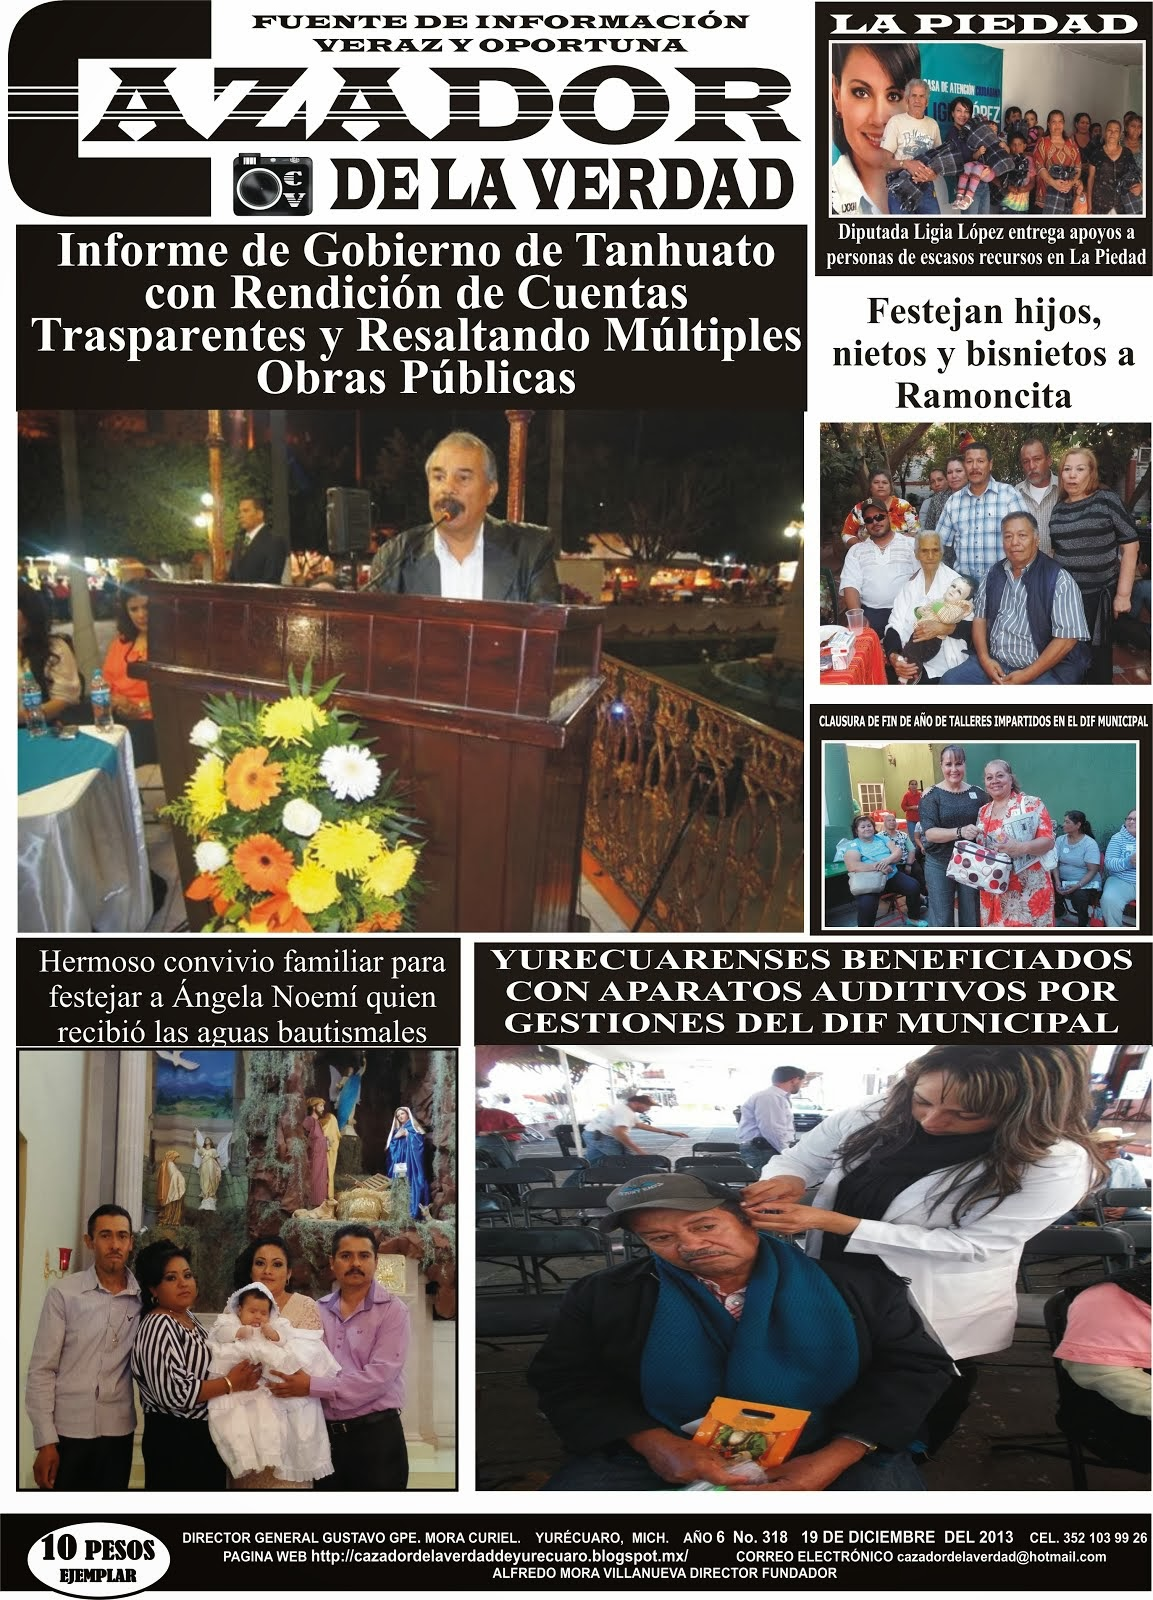 PERIODICO IMPRESO 19 DE DICIEMBRE DE 2013 CAZADOR